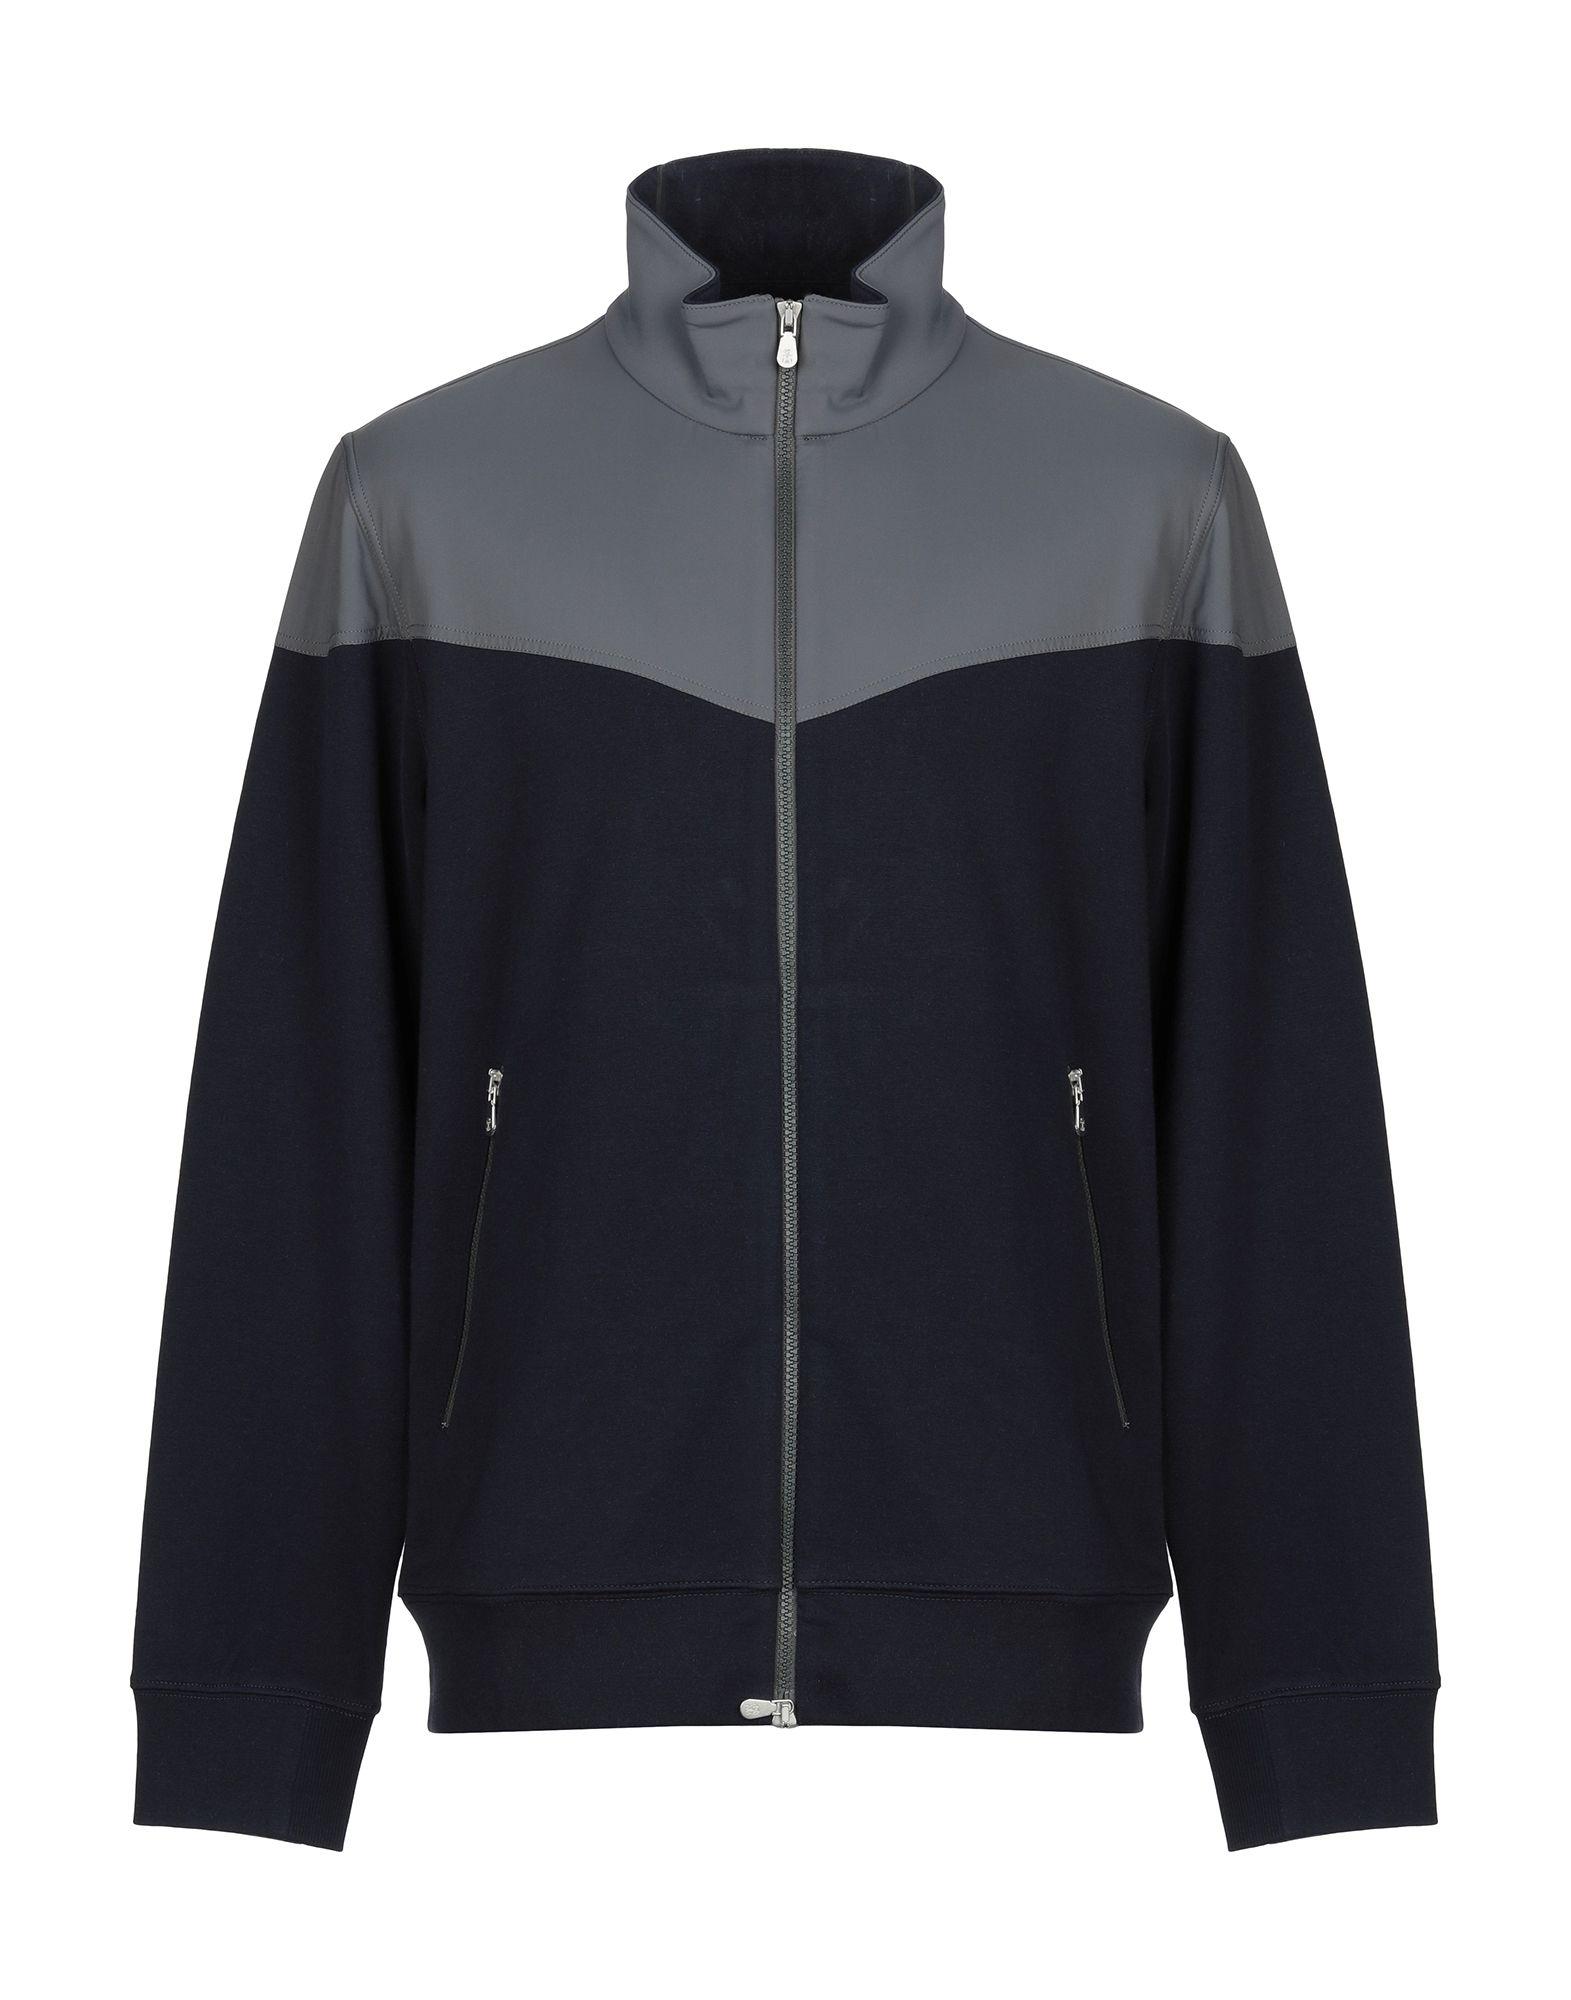 Brunello Cucinelli Sweatshirt - Men Brunello Cucinelli Sweatshirts online  on YOOX Latvia - 12270999UB 4811ea5e77